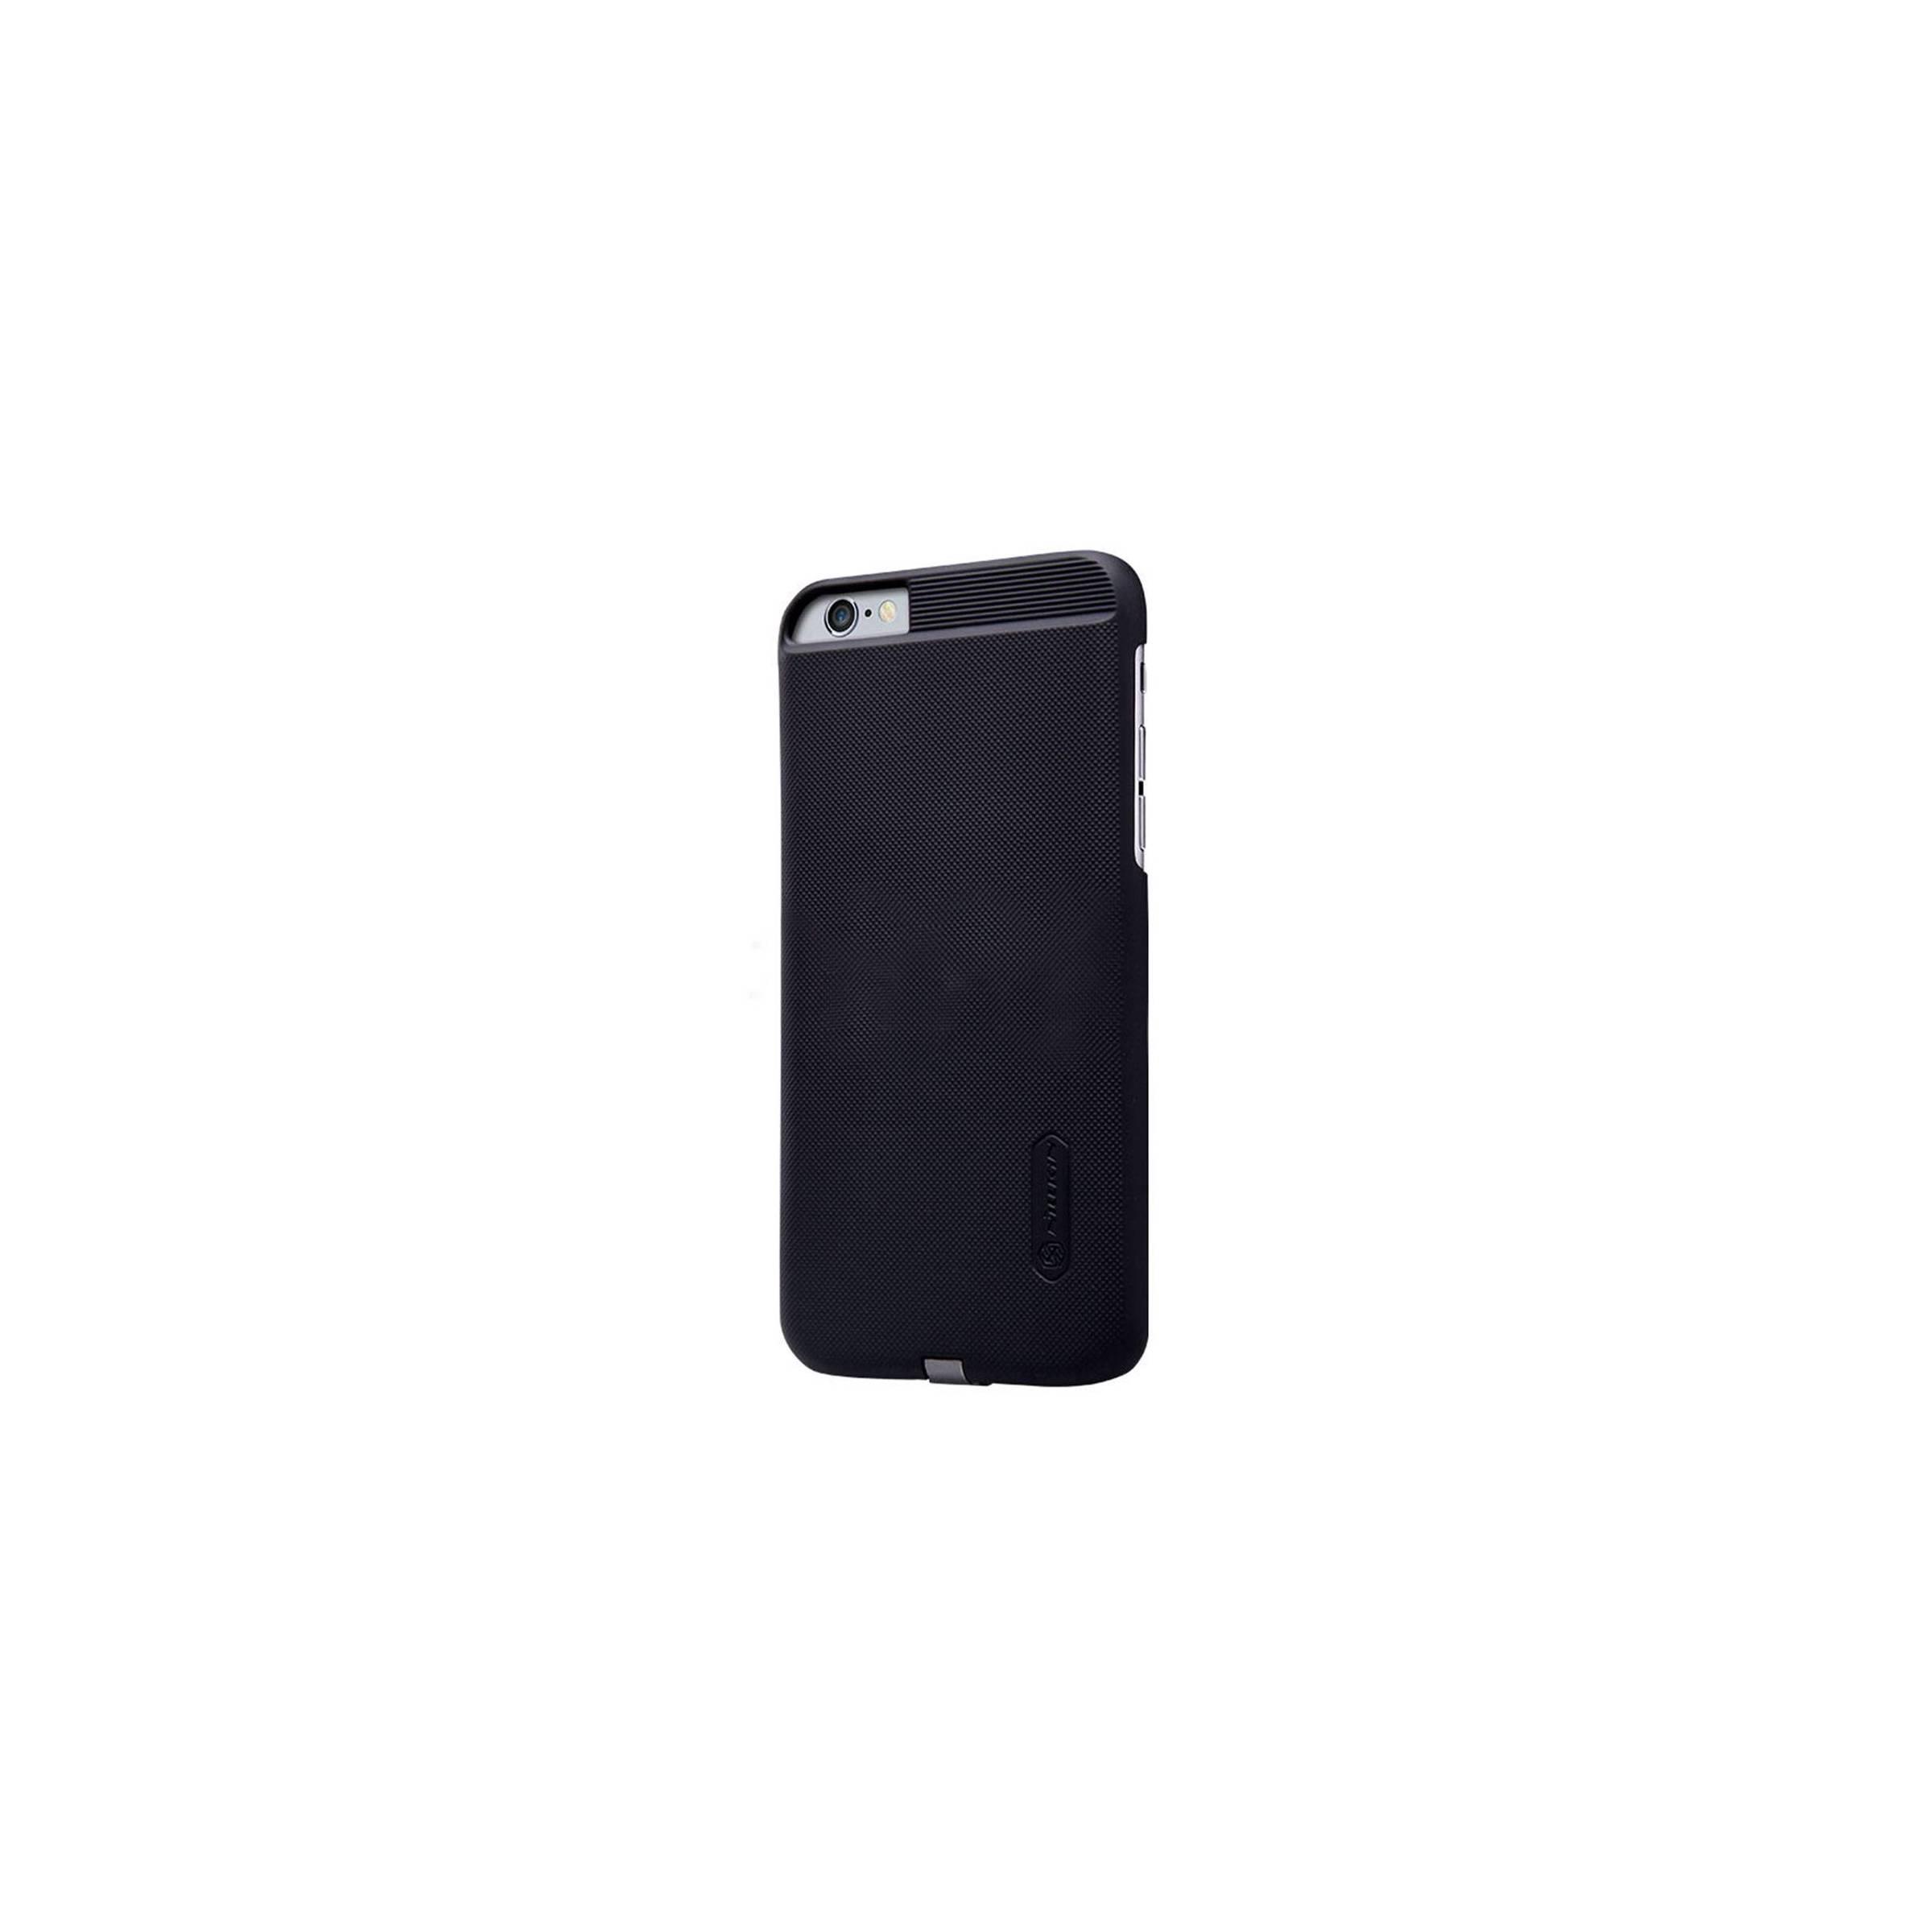 nillkin Magic cover til qi opladning på iphone iphone iphone 6 plus/ 6s plus fra mackabler.dk